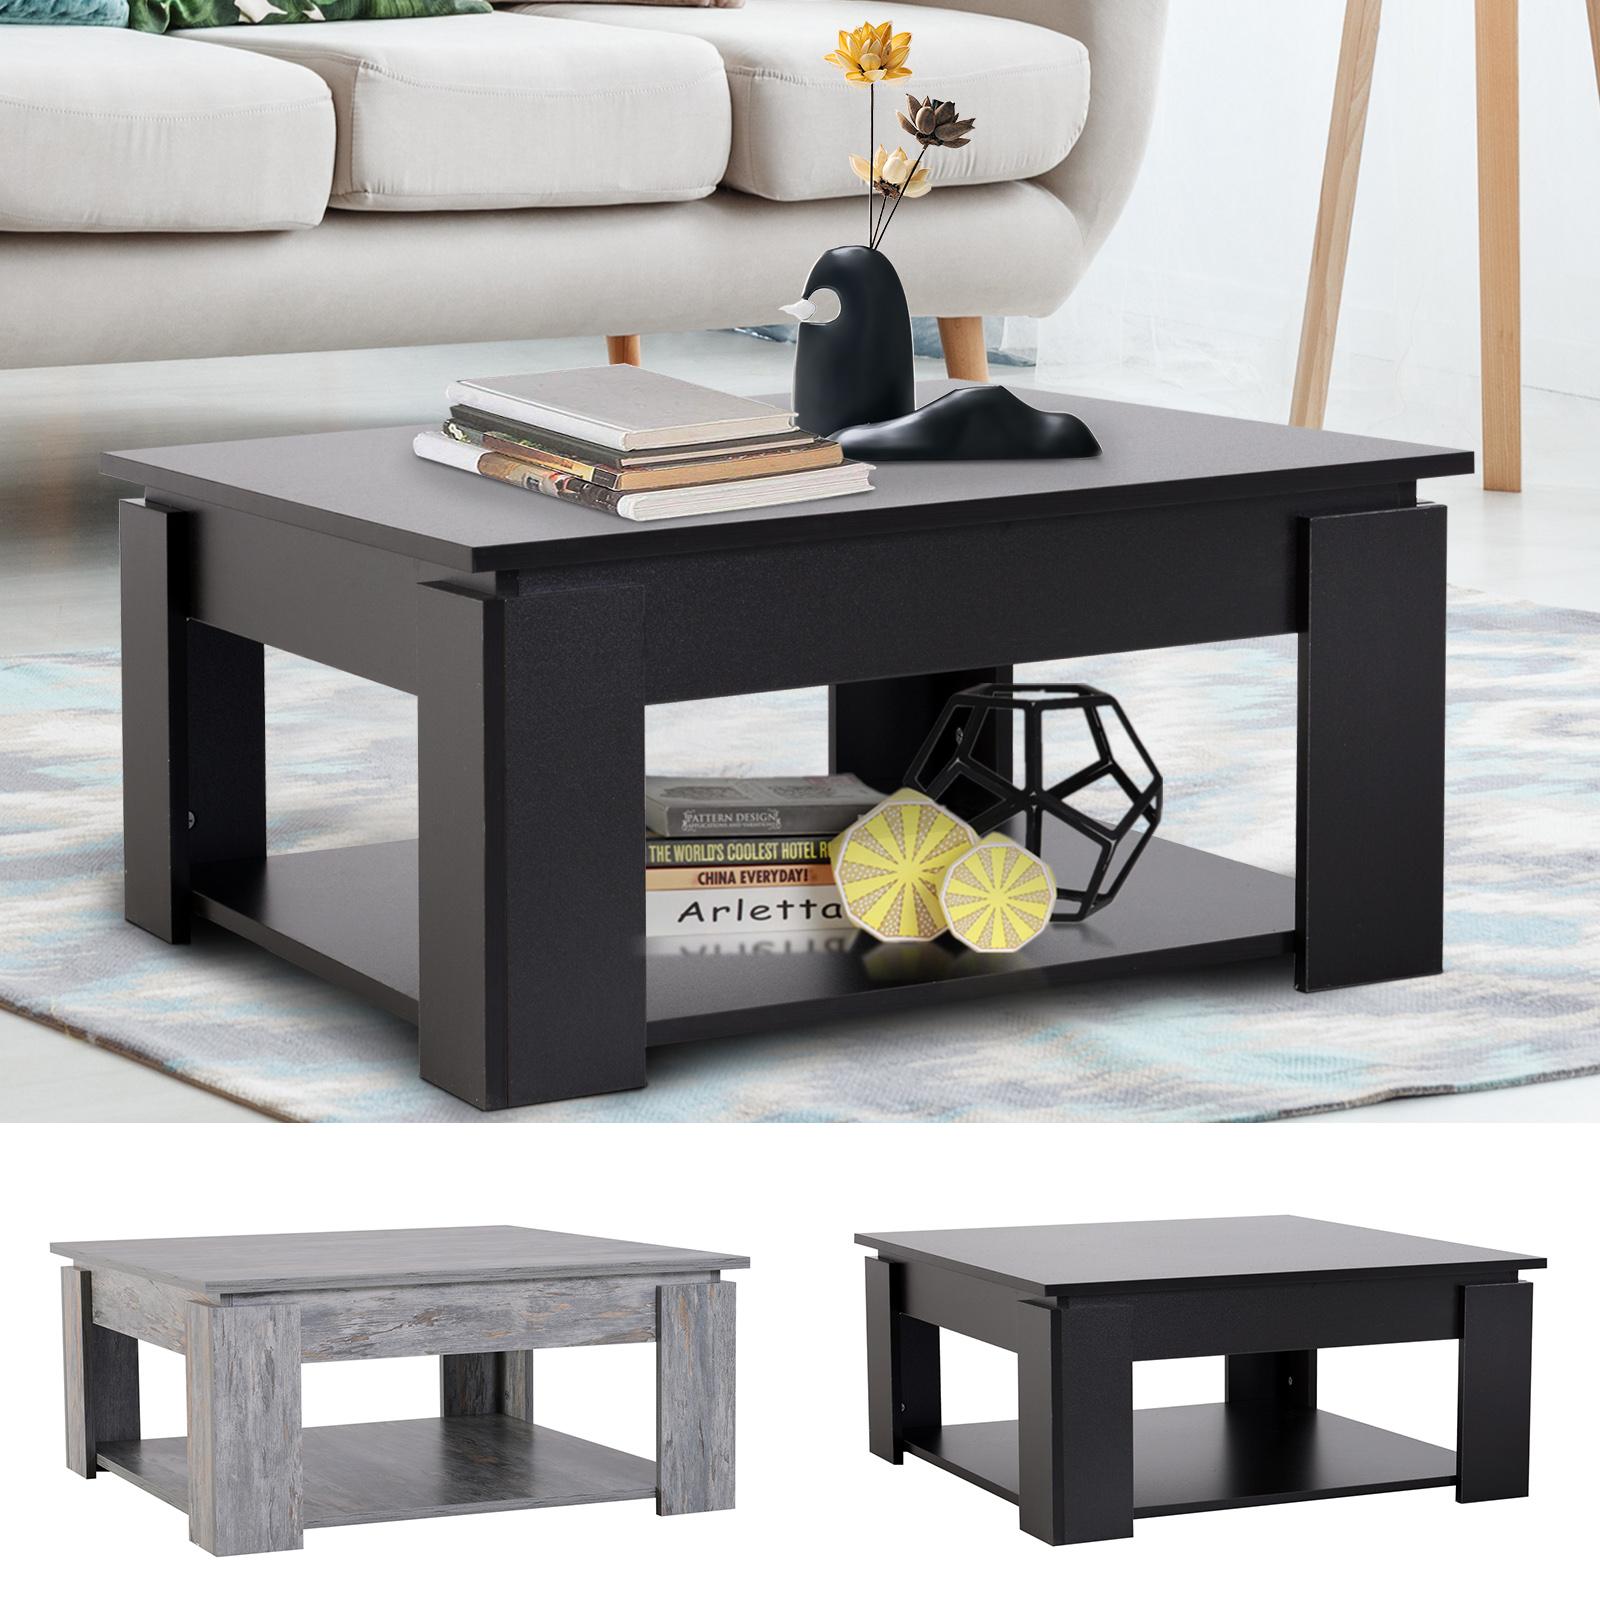 2 tier modern coffee table end table bottom shelf living room ebay